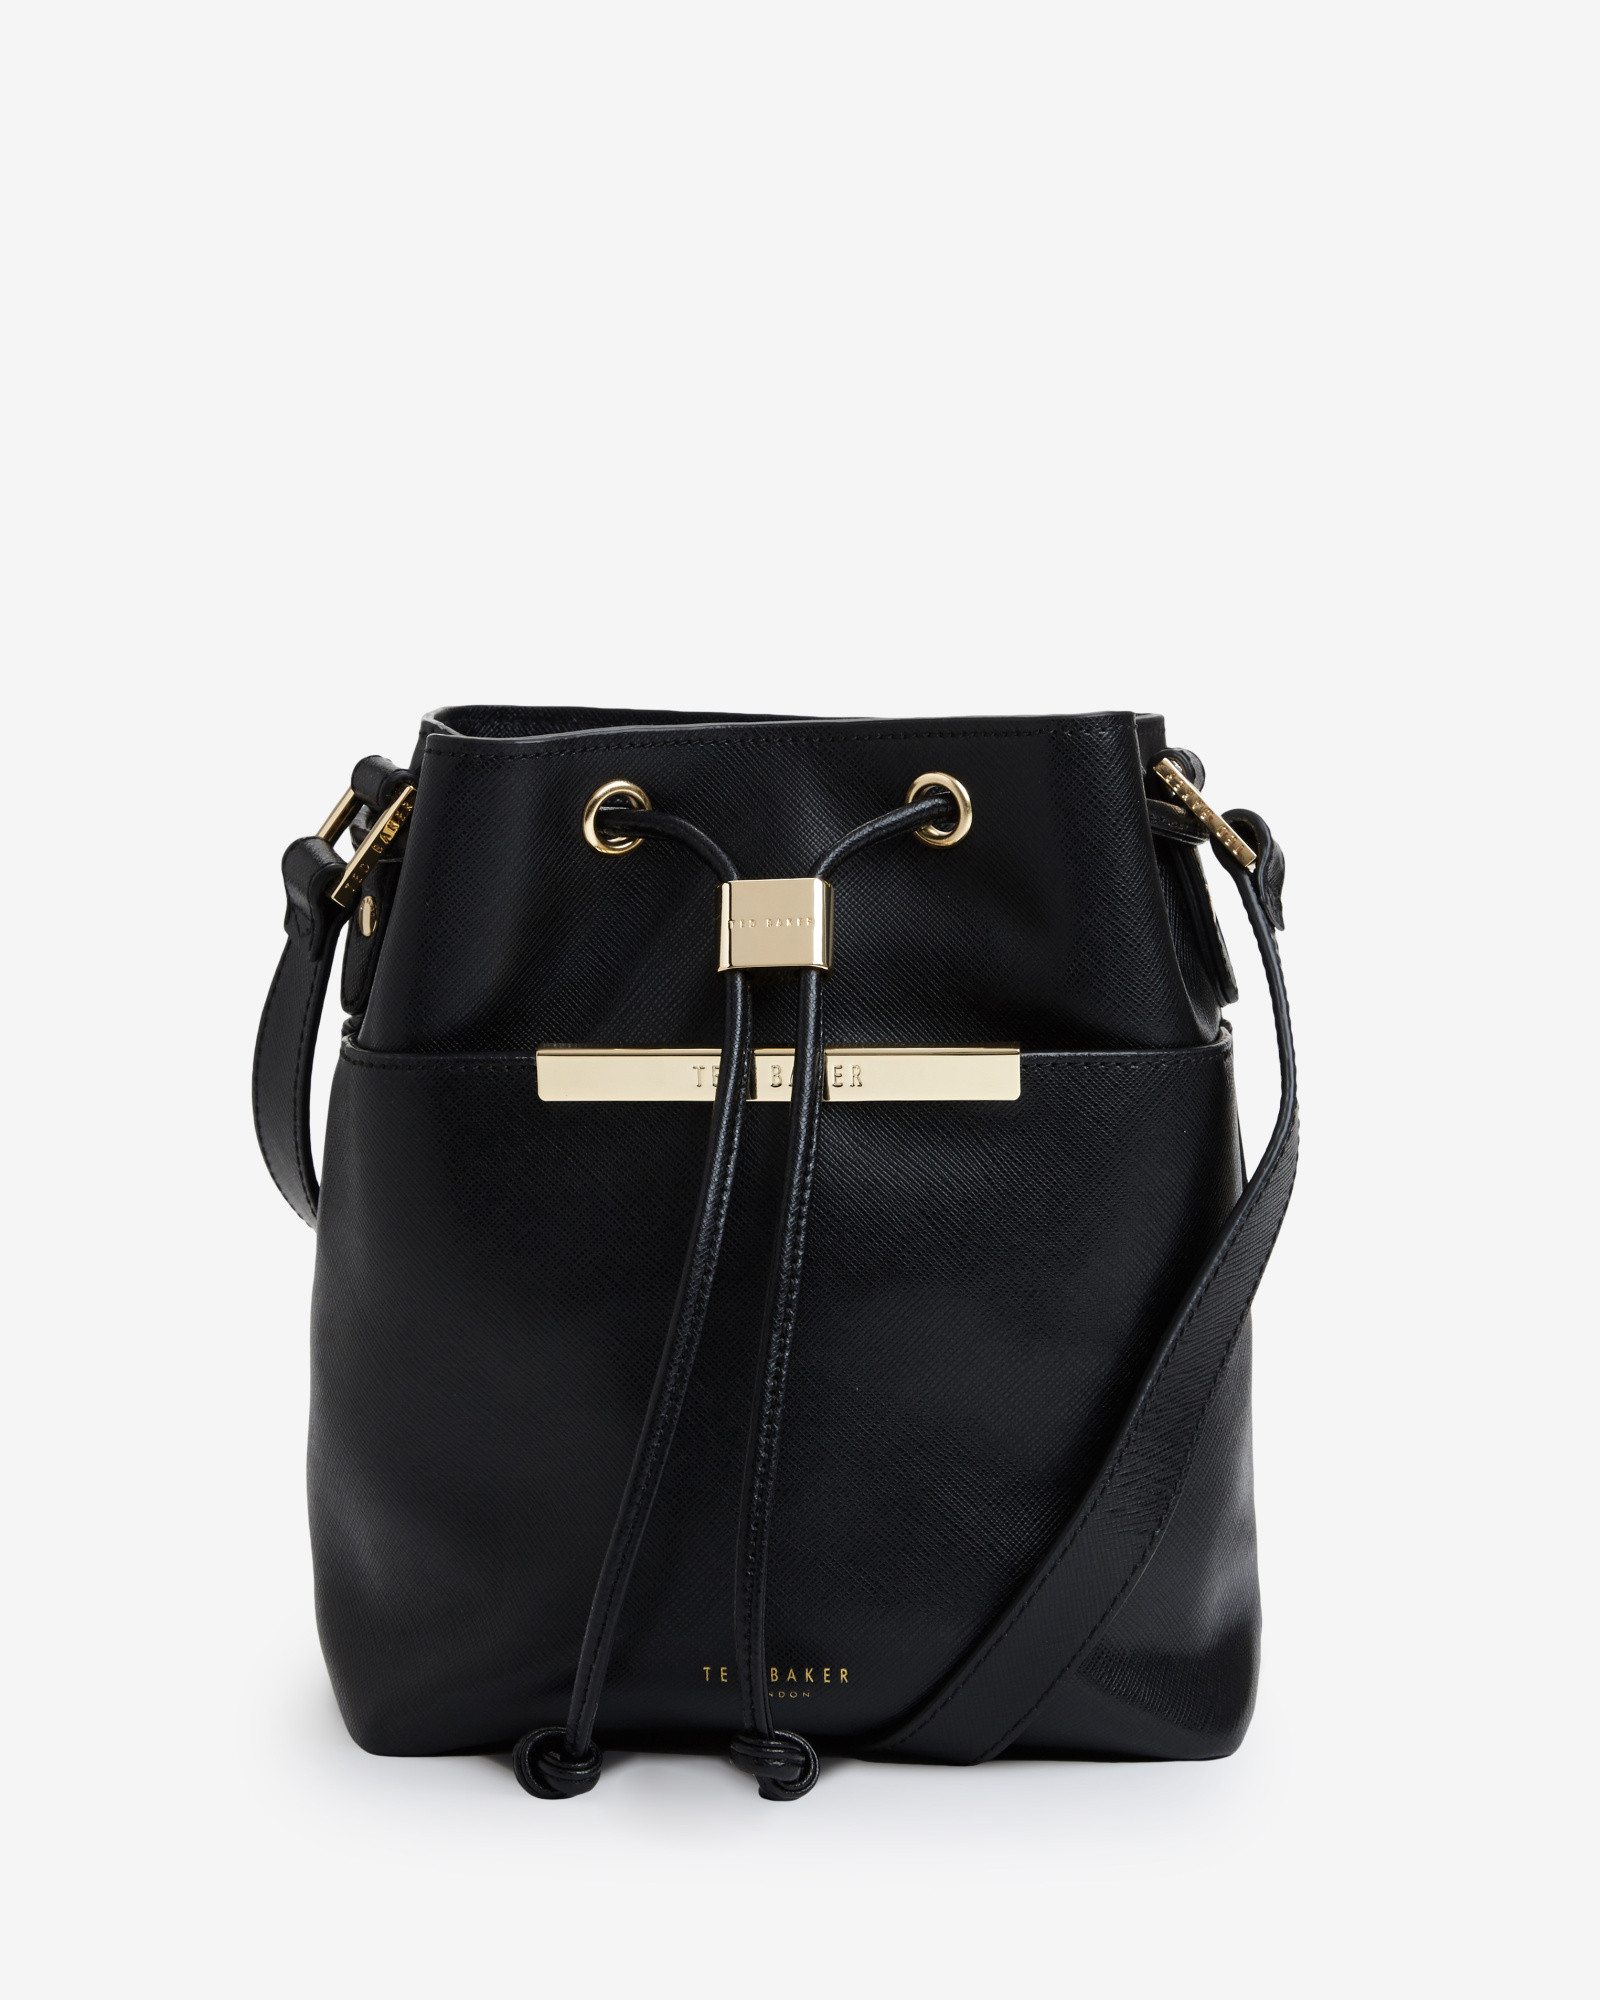 4e2ff911ff93ab Ted Baker Crosshatch Leather Mini Bucket Bag in Black - Lyst